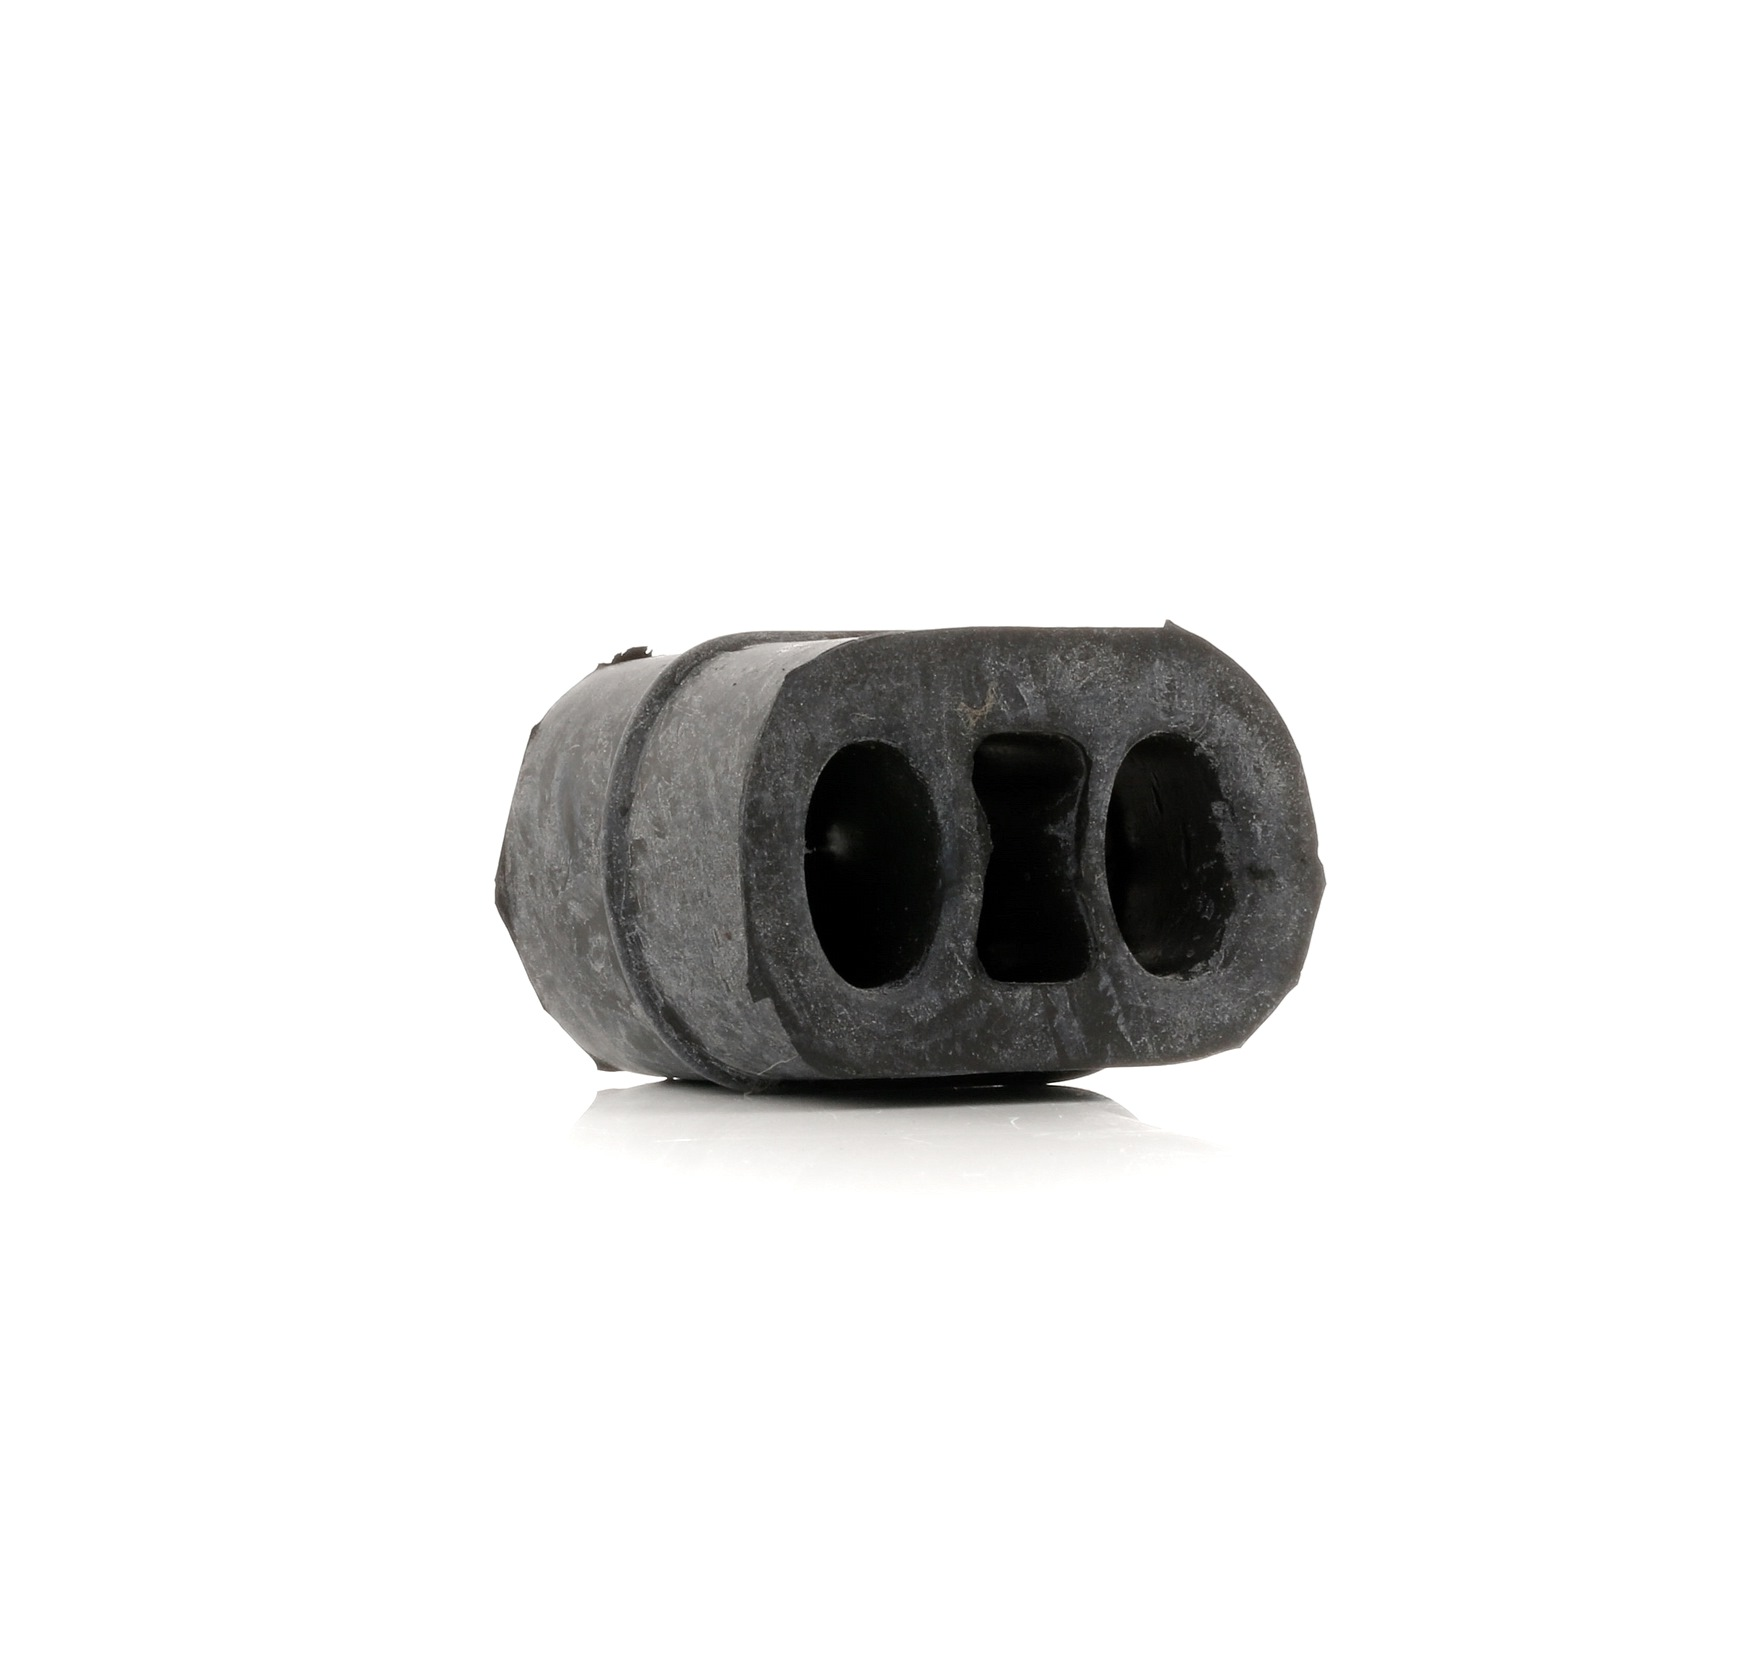 OPEL CORSA 2021 Gummistreifen, Abgasanlage - Original BOSAL 255-095